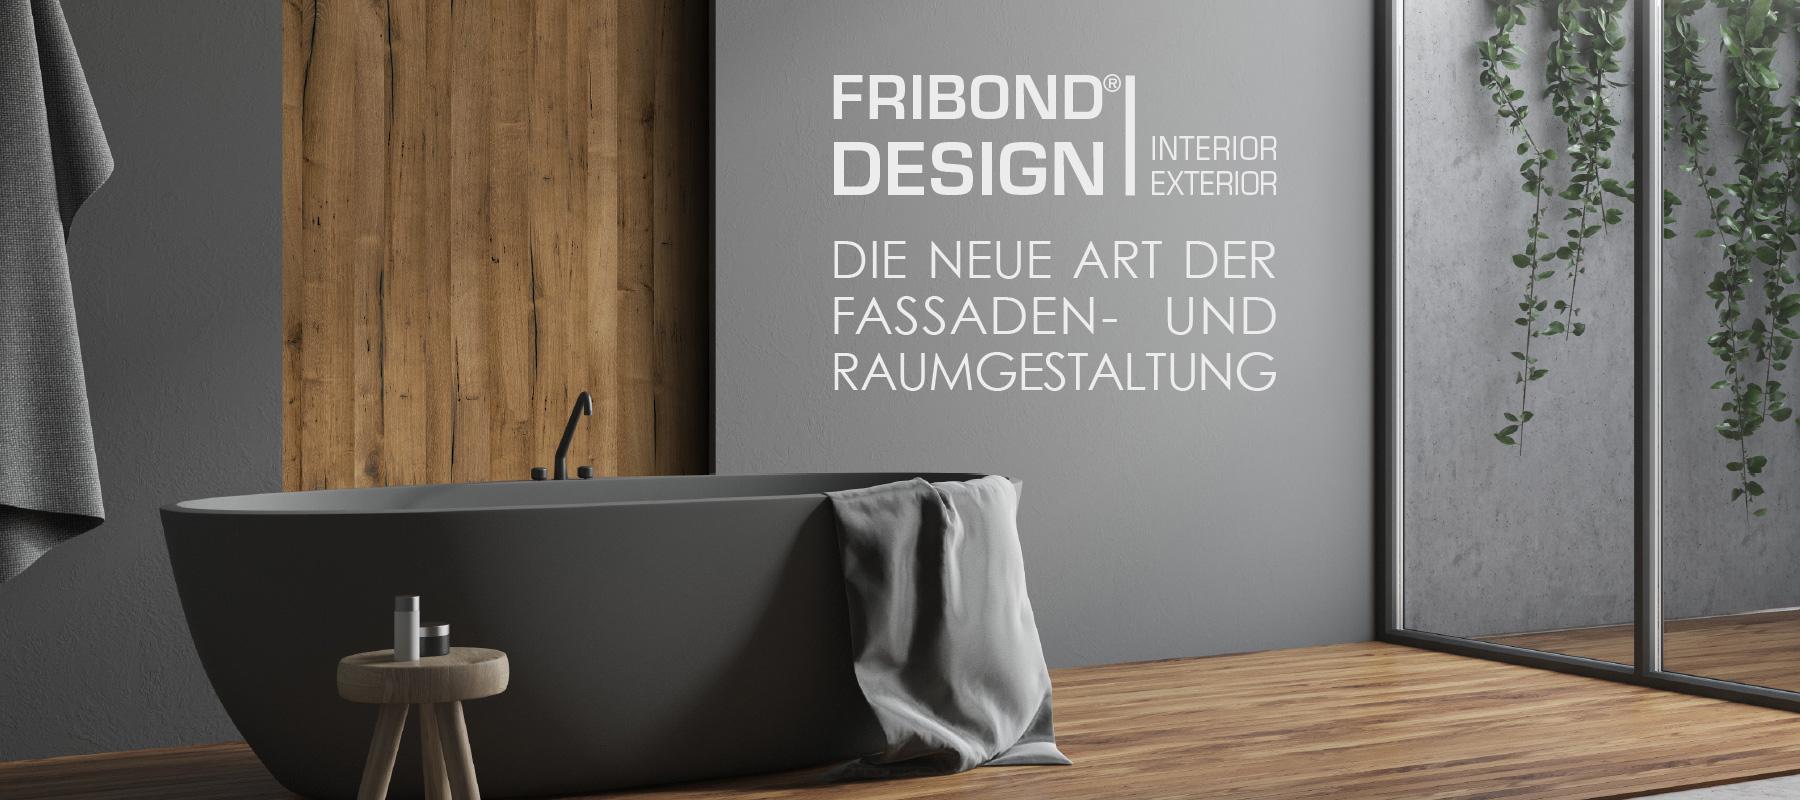 Wandverkleidung Marmor Verblendung Fribond Design Interior Aluminium Verbundplatte Preis Kaufen